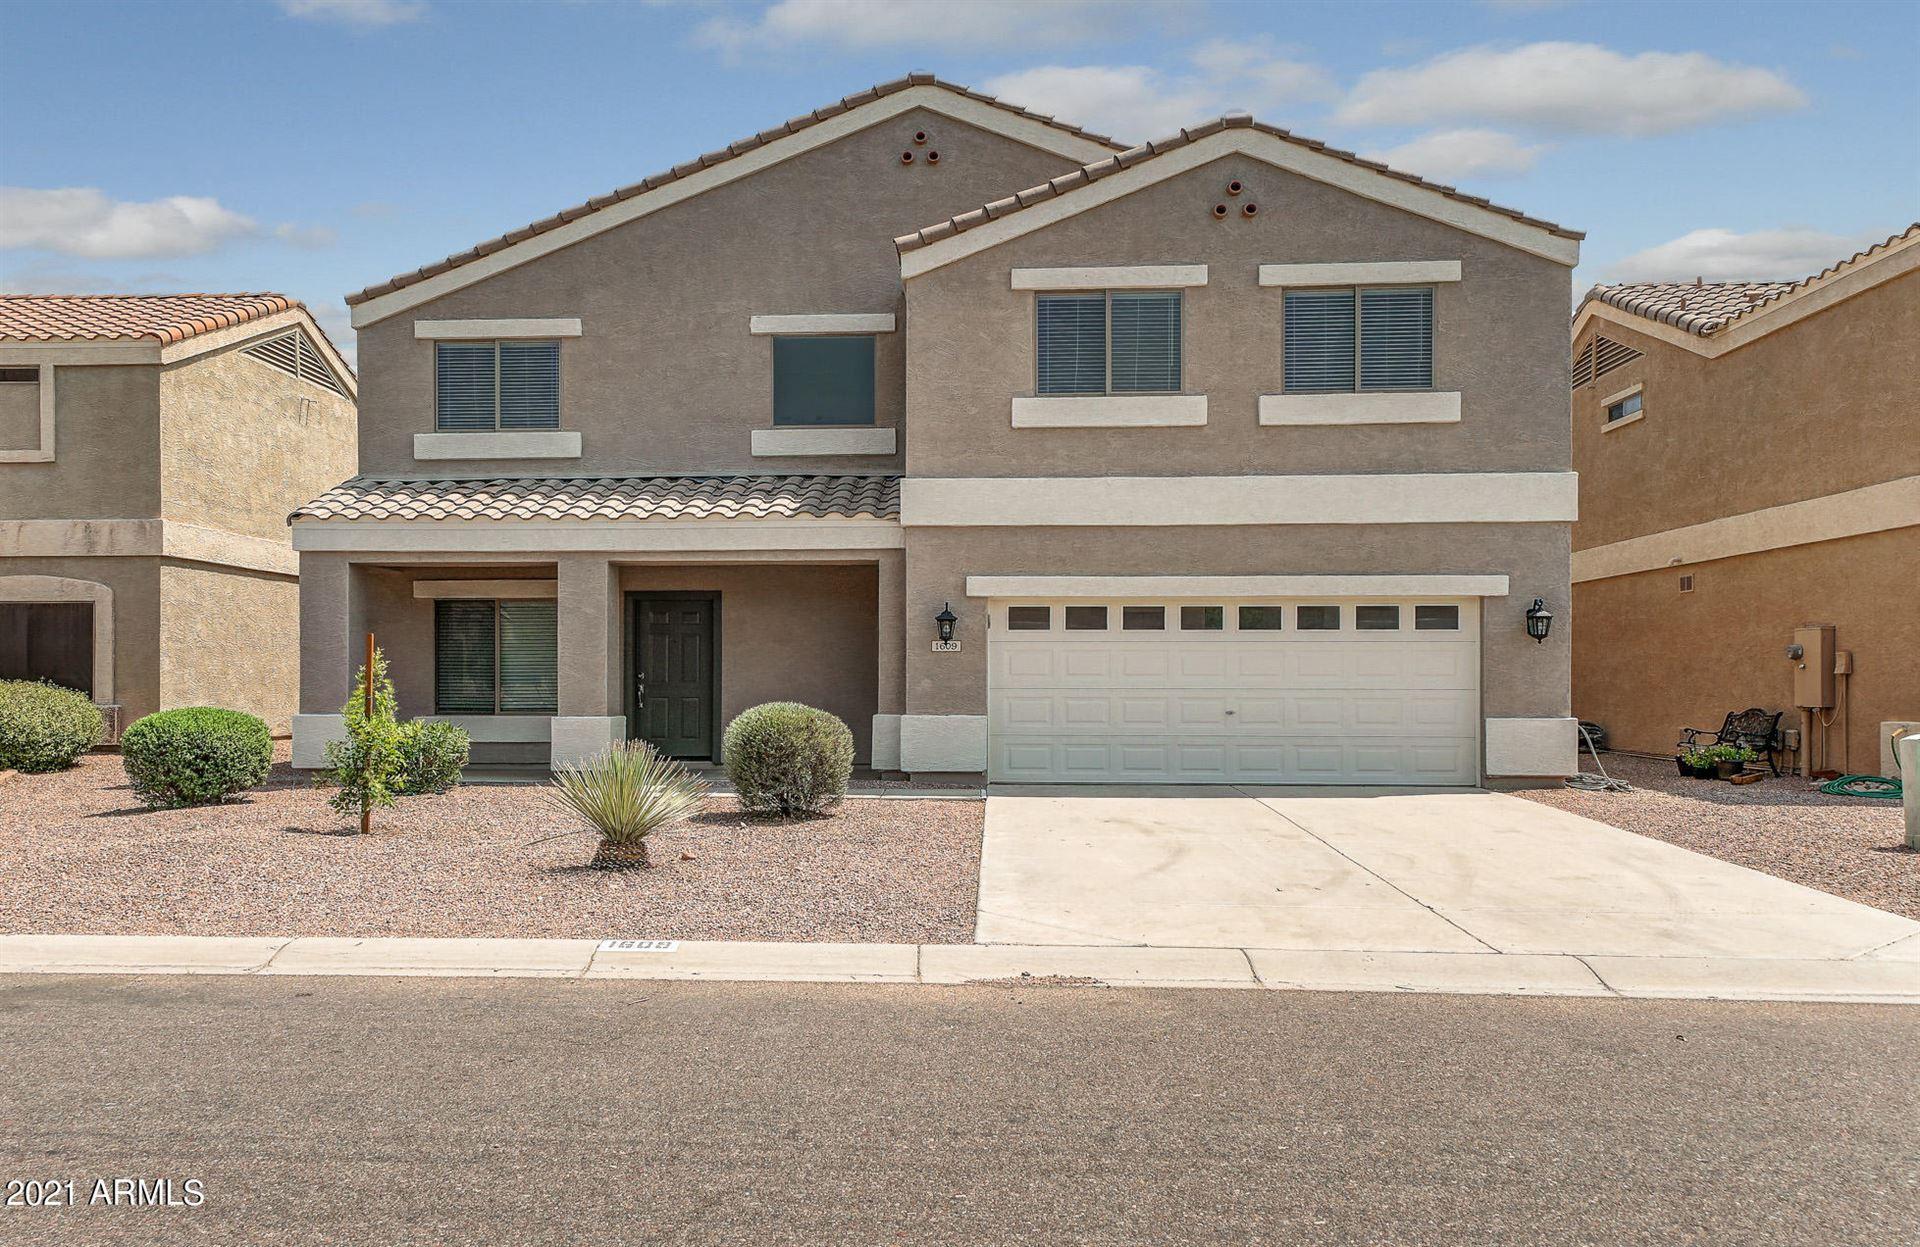 1609 E HEATHER Drive, San Tan Valley, AZ 85140 - MLS#: 6264654